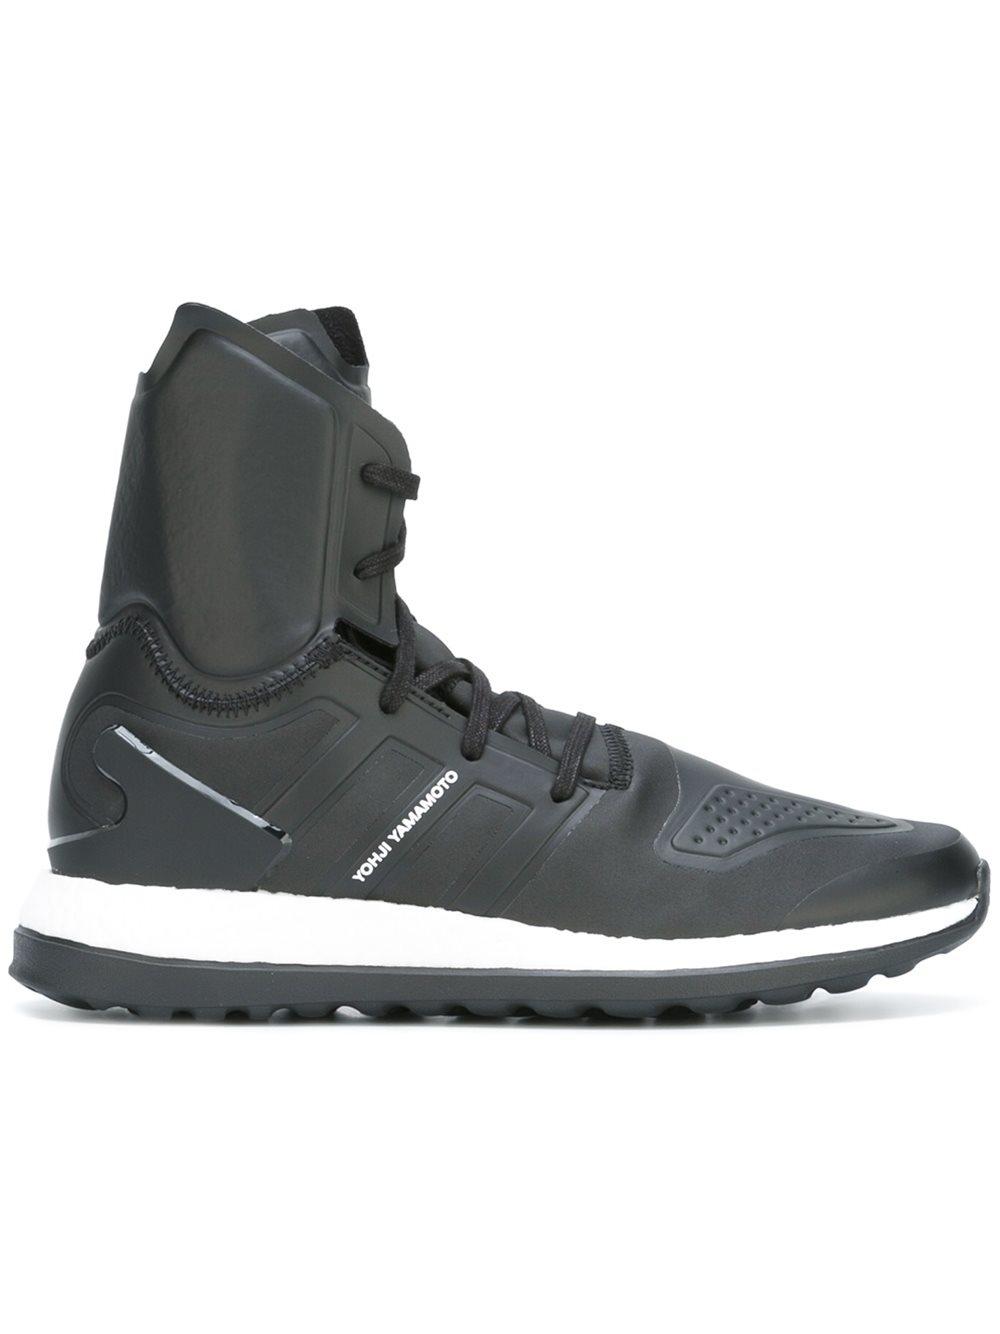 lyst y 3 pureboost zg hi top sneakers in black for men. Black Bedroom Furniture Sets. Home Design Ideas